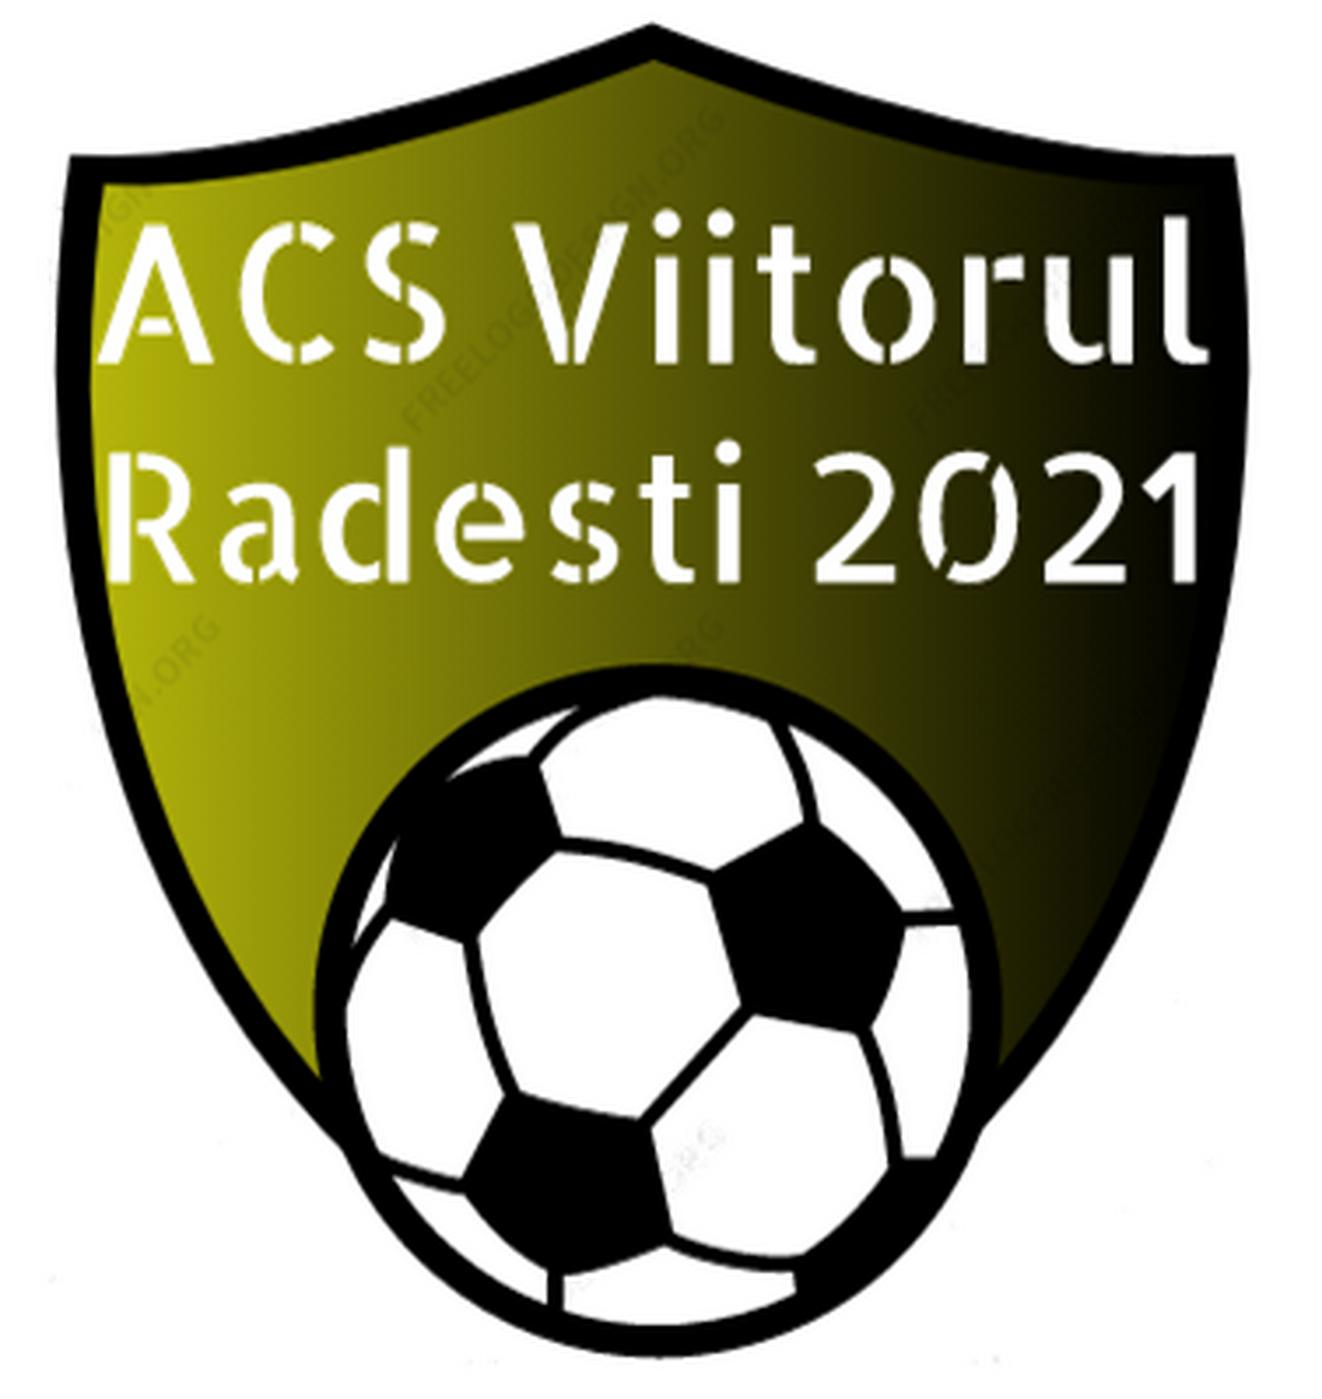 A C S Viitorul Radesti 2021